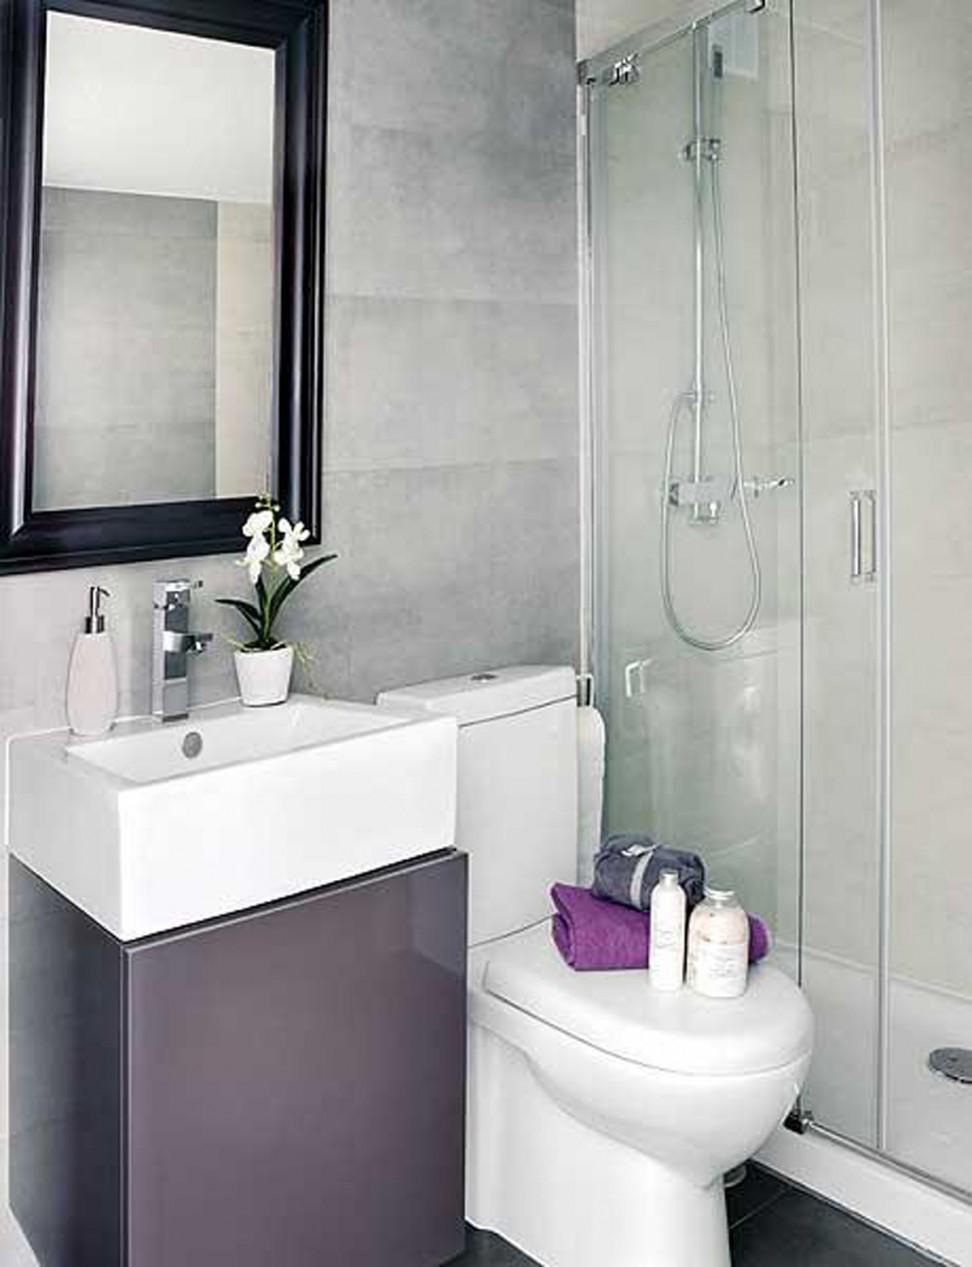 Gallery — Bathroom Pods - Melbourne - Sydney - Brisbane - New Zealand